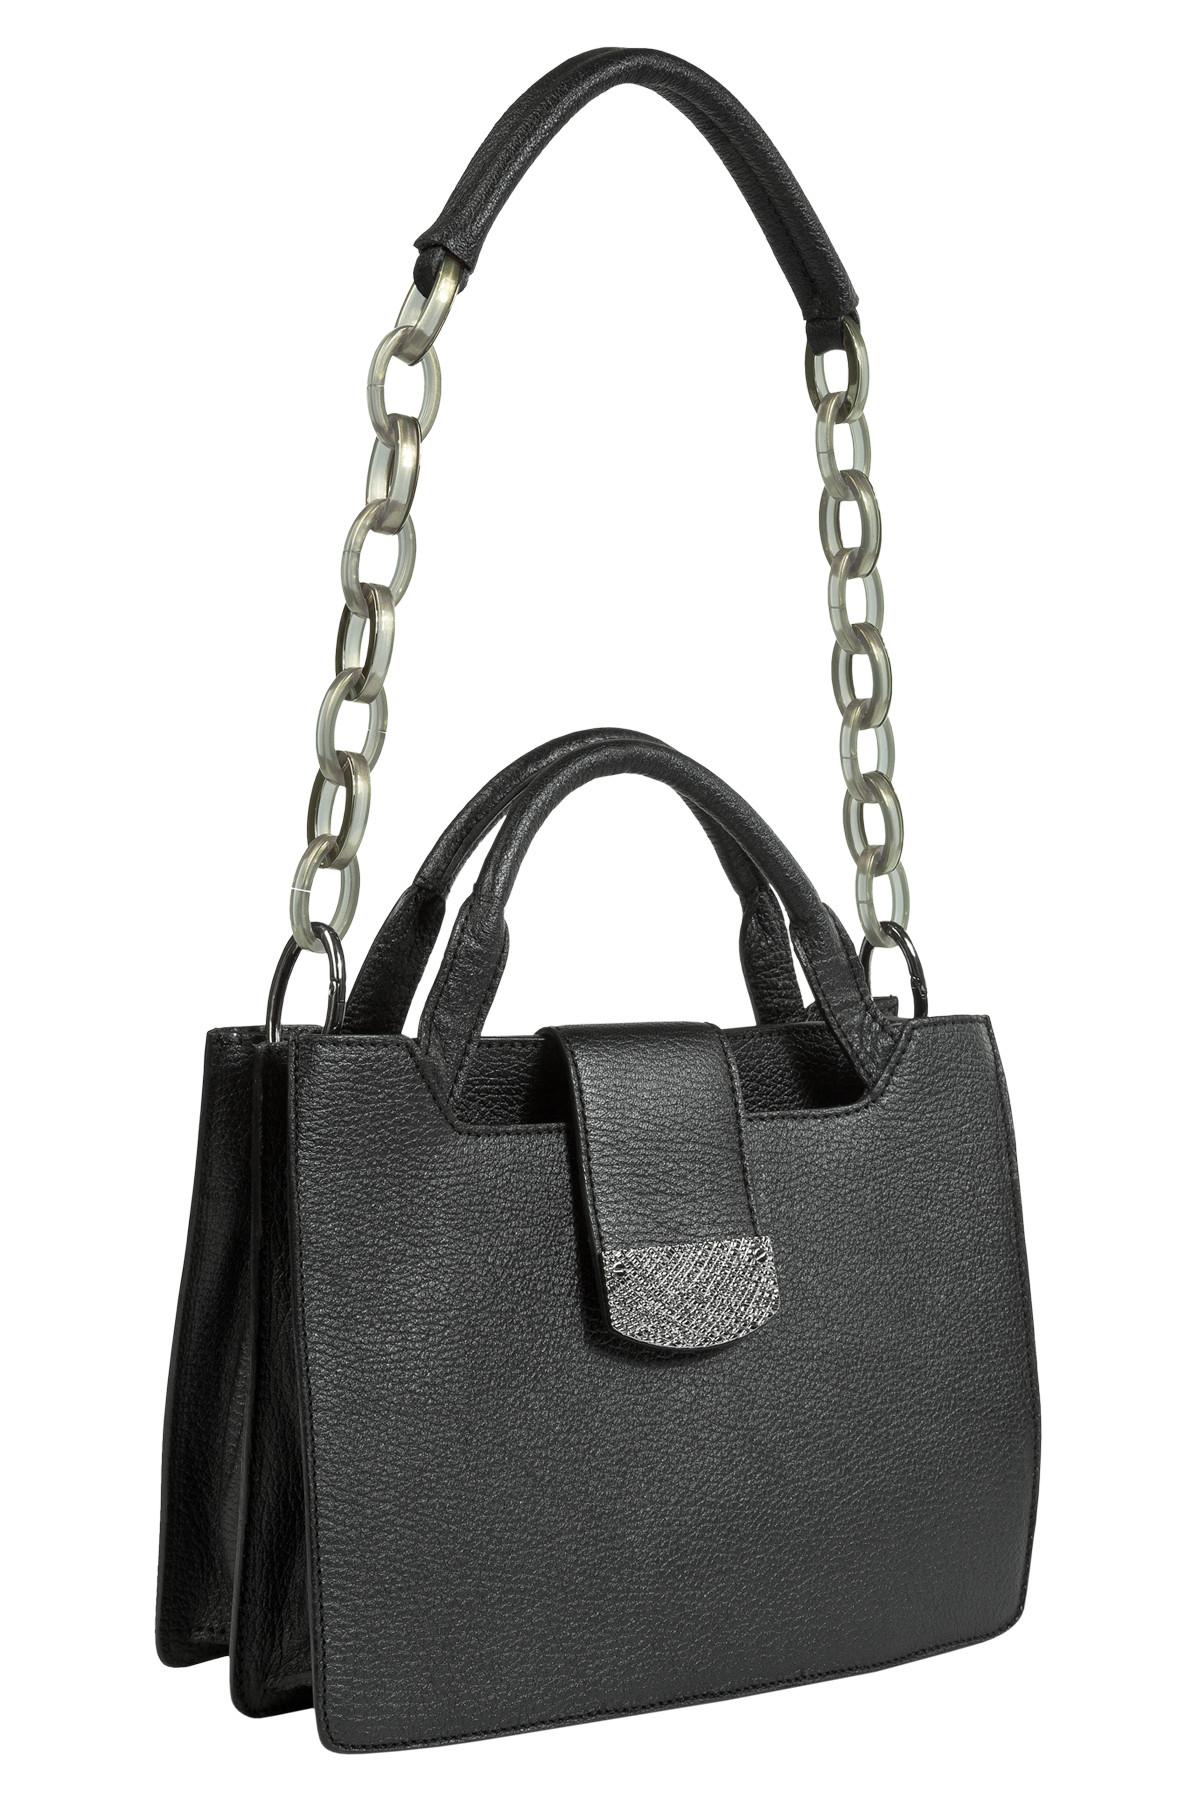 GLAZE bag  - Bags - Shop | SCHUMACHER - Onlineshop